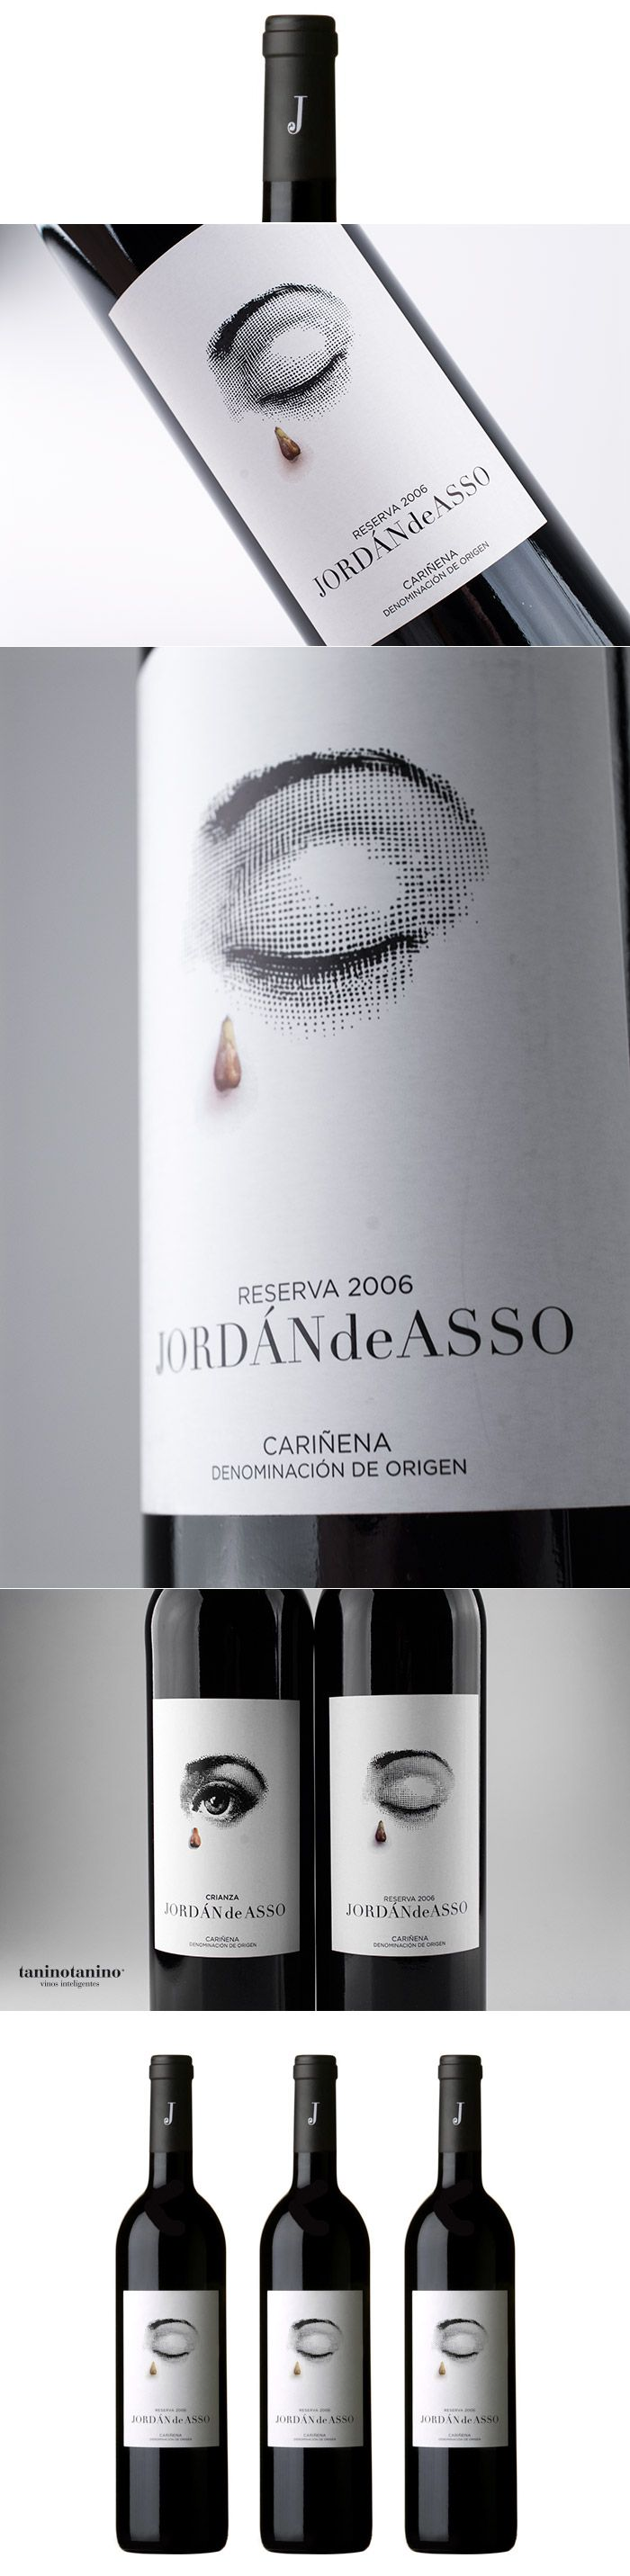 JORDAN DE ASSO RESERVA 2006 - TANINOTANINO VINOS INTELIGENTES wine / vinho / vino mxm